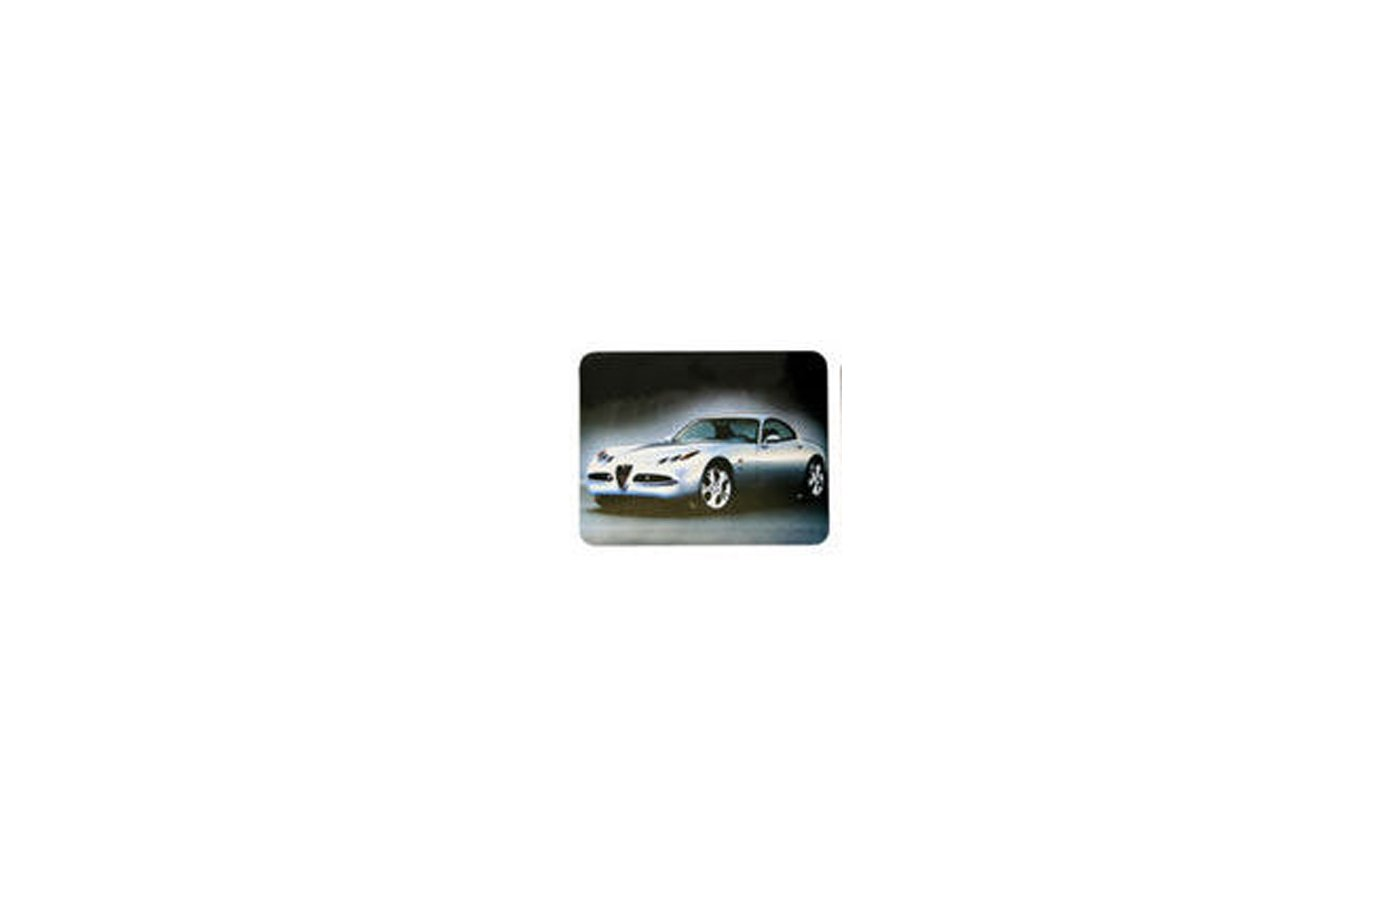 Коврик для мыши BURO BU-M90002 пластиковый автомобиль (230x180x2)